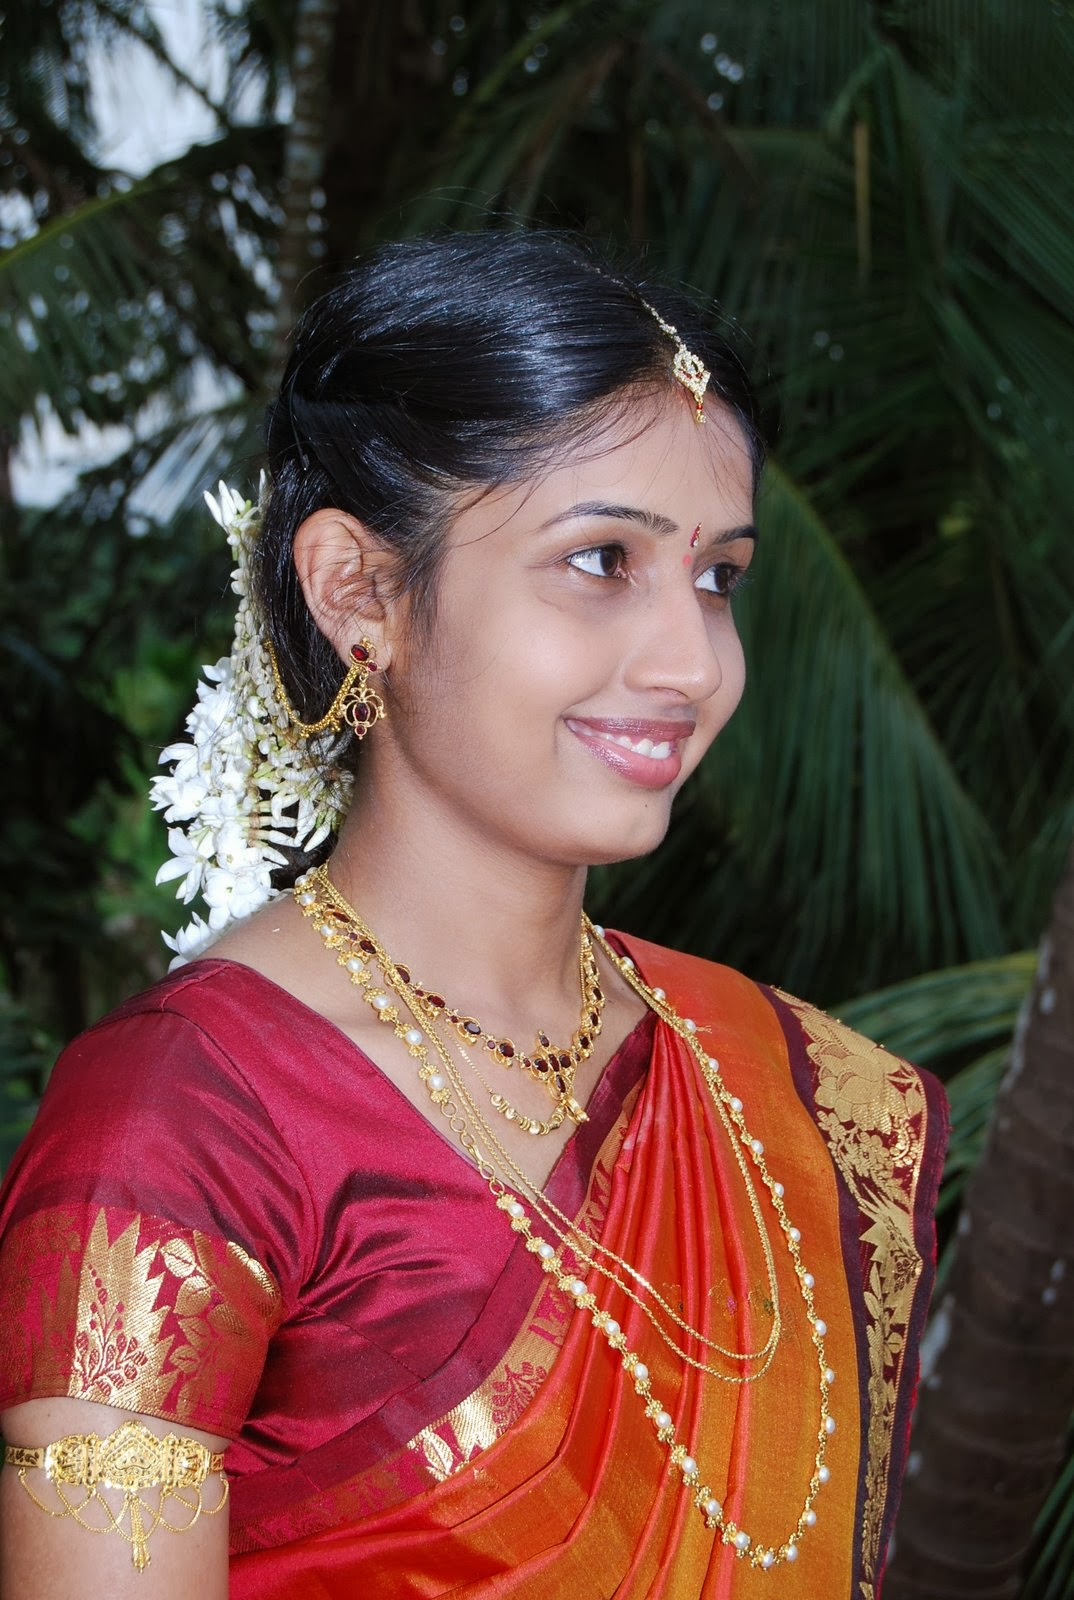 andhamina bhamalu : beautiful indian womens 3326